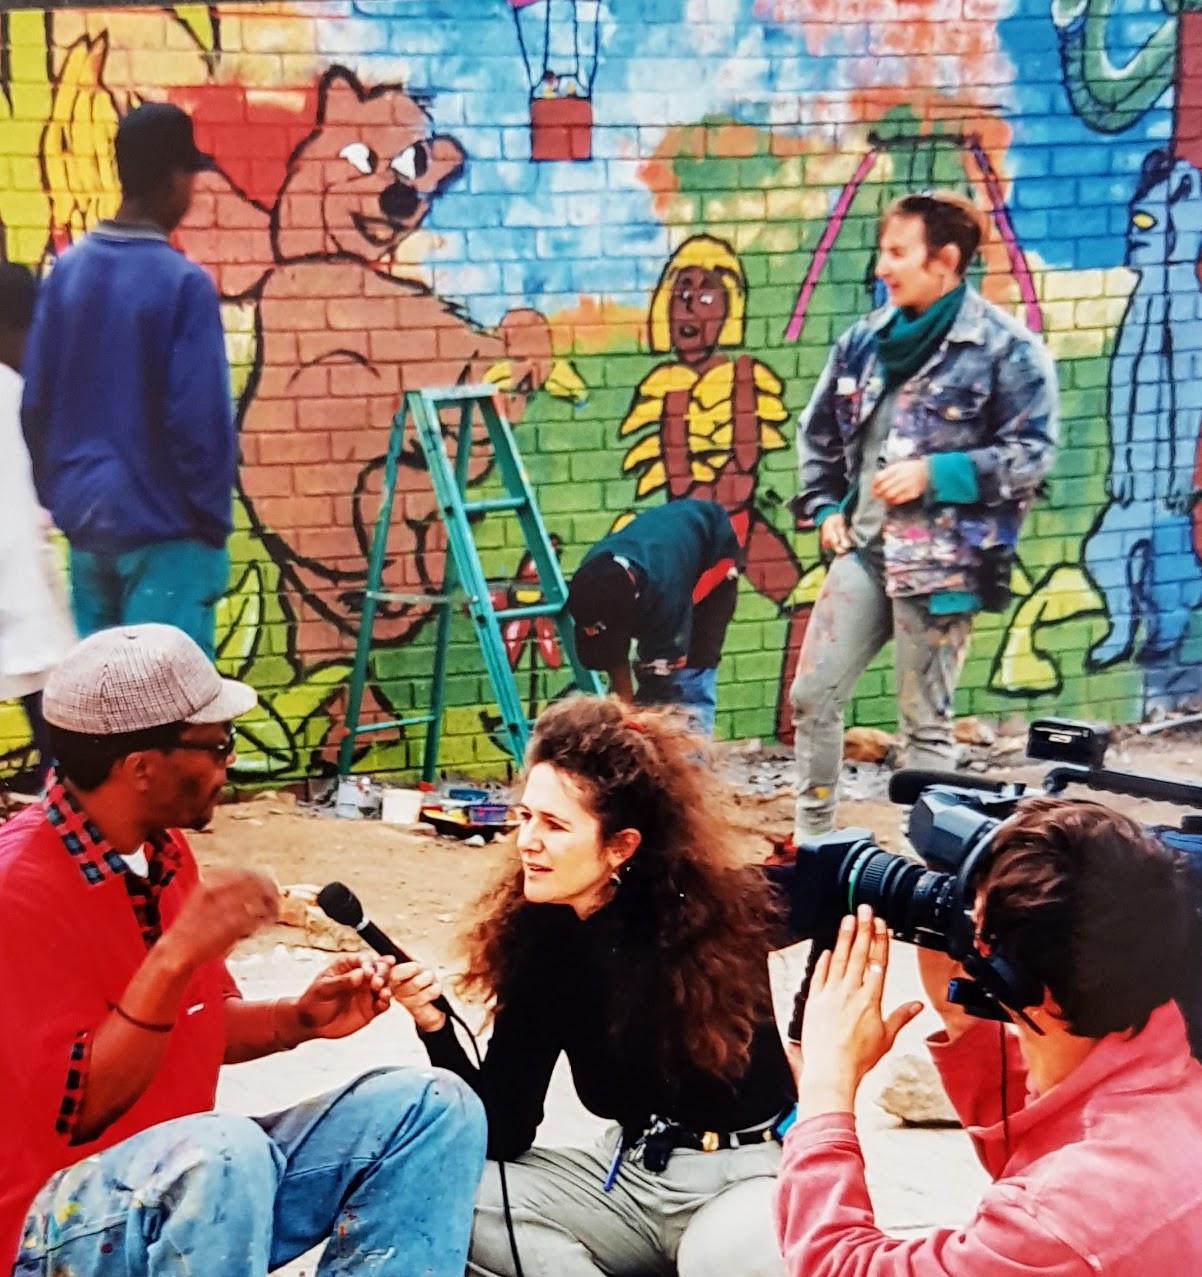 Kathy Berman interviews Alex mural artis